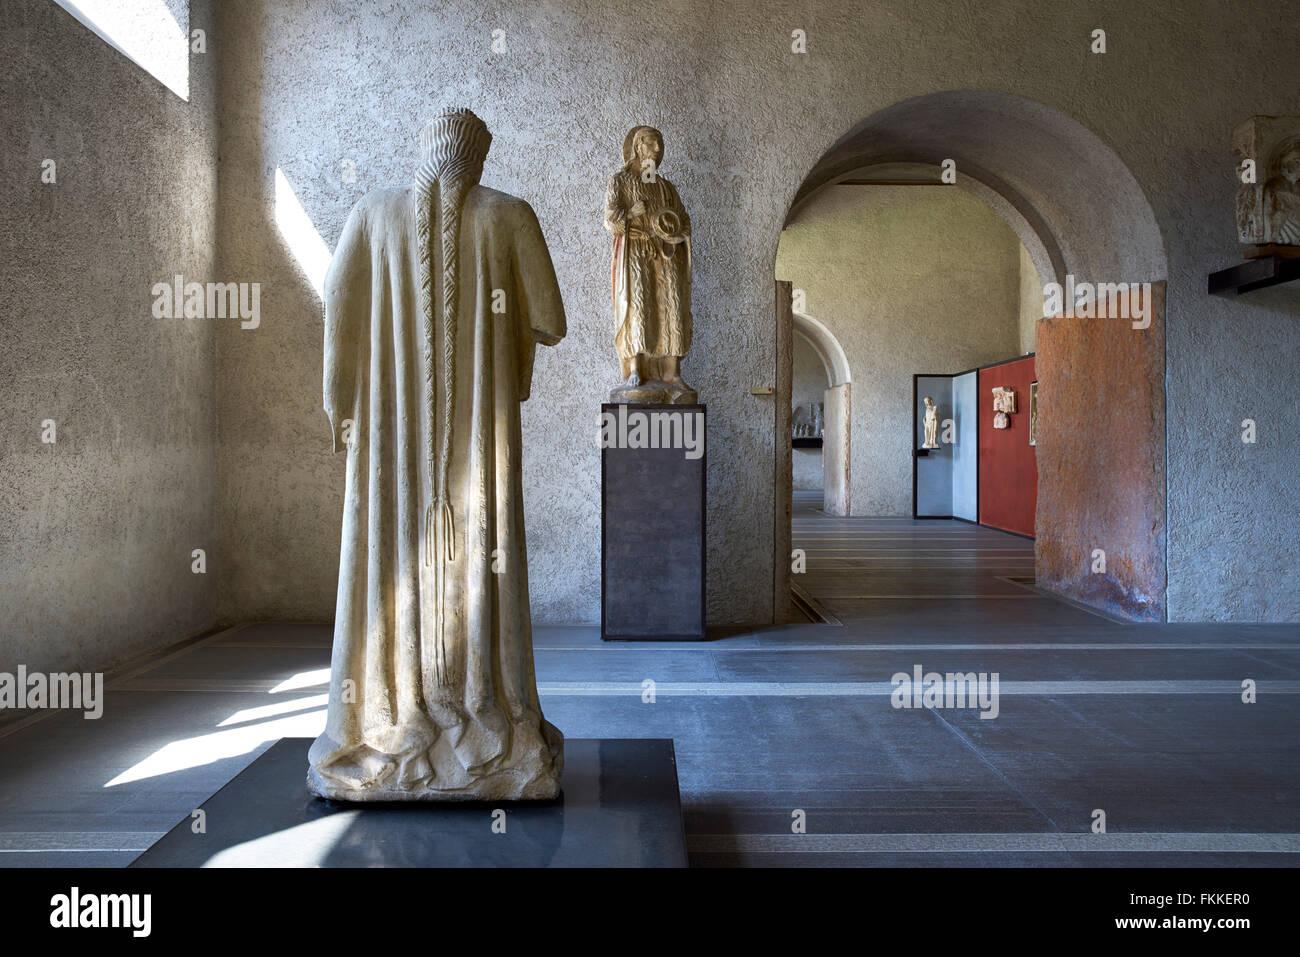 An Interior view of a historic building in Verona, the museum Museo Civico di Castelvecchio - Stock Image